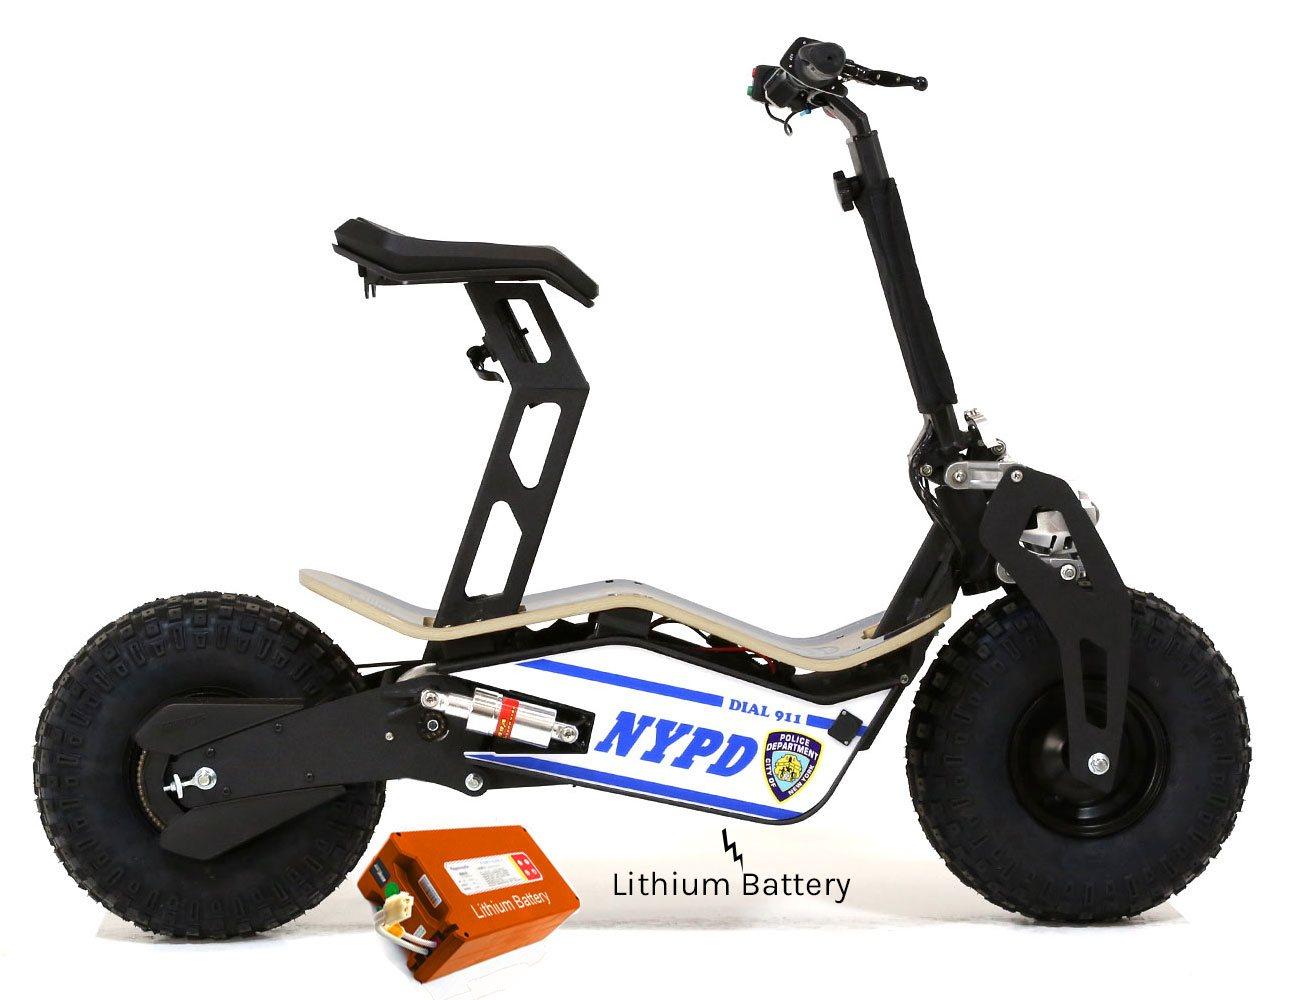 velocifero mad 48 volt 1600w lithium battery nypd blue. Black Bedroom Furniture Sets. Home Design Ideas